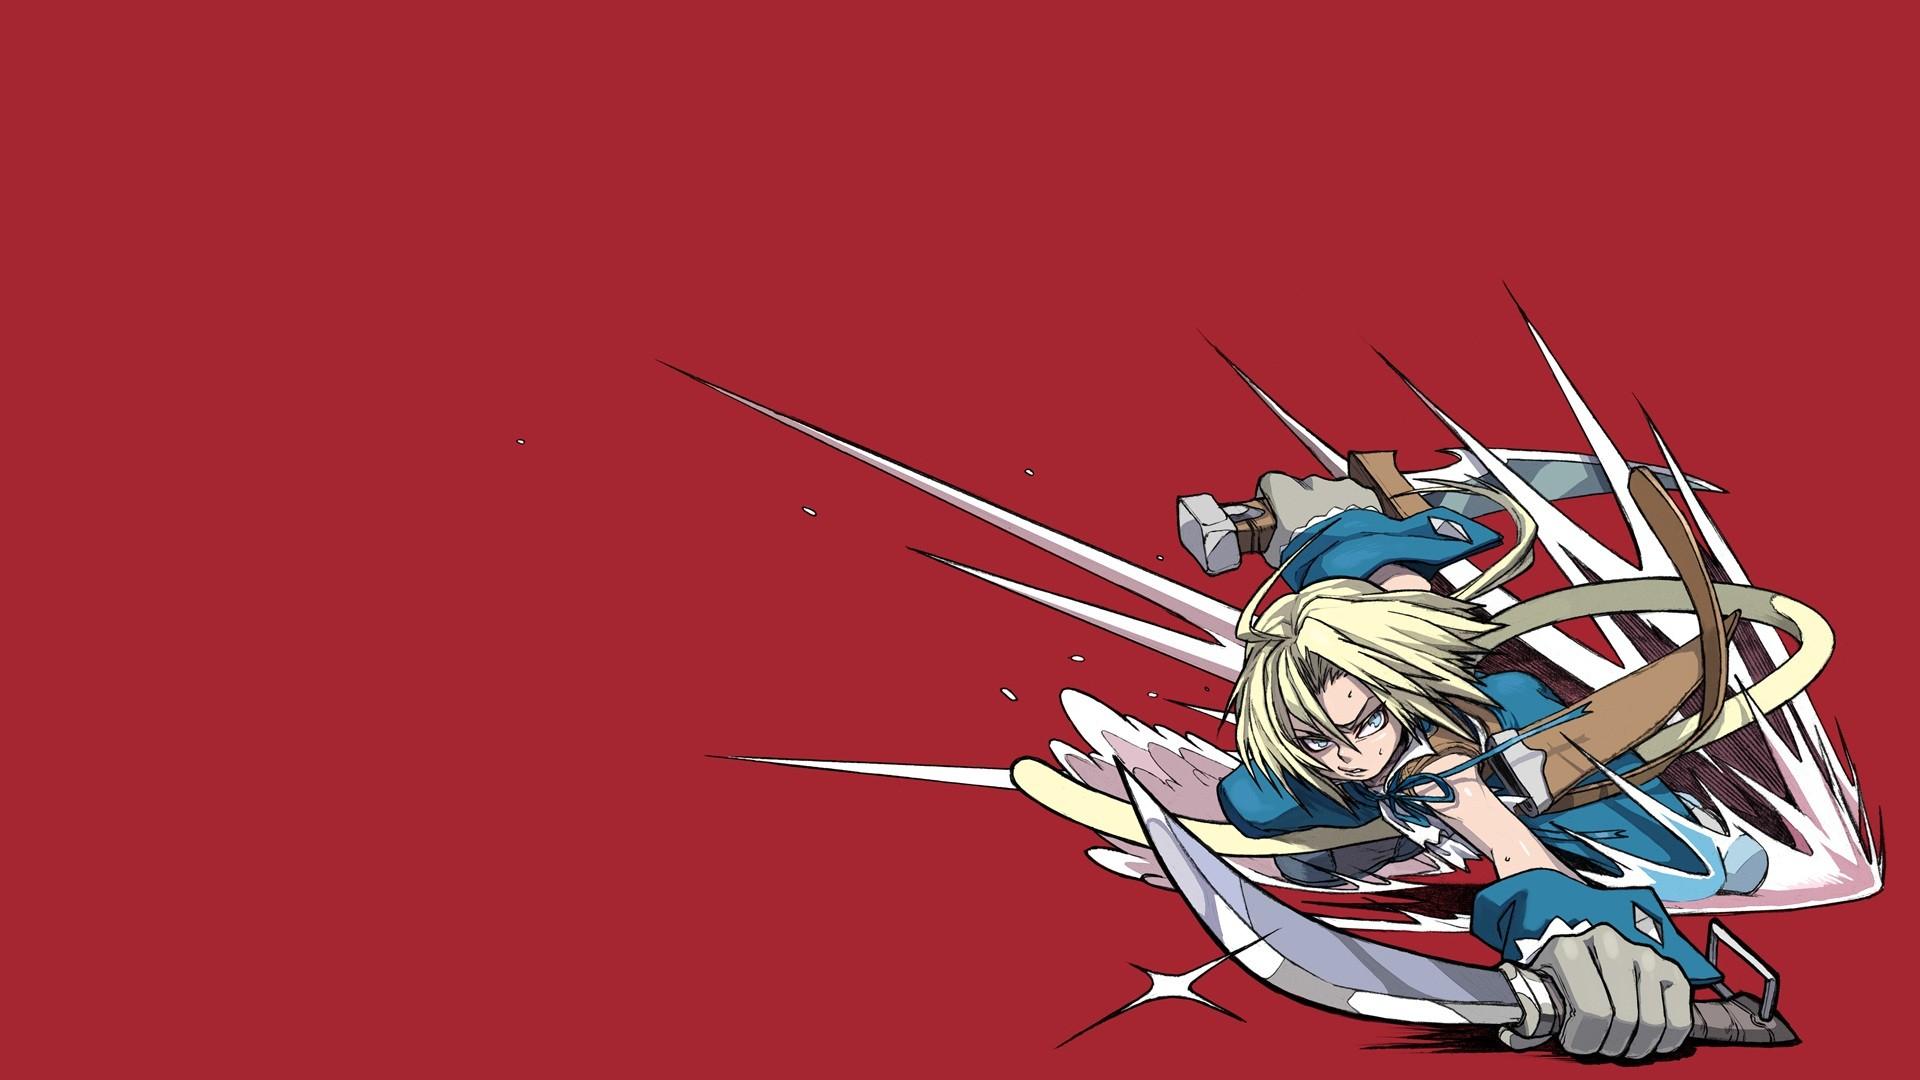 Tails Video Games Final Fantasy IX Daggers Zidane Tribal